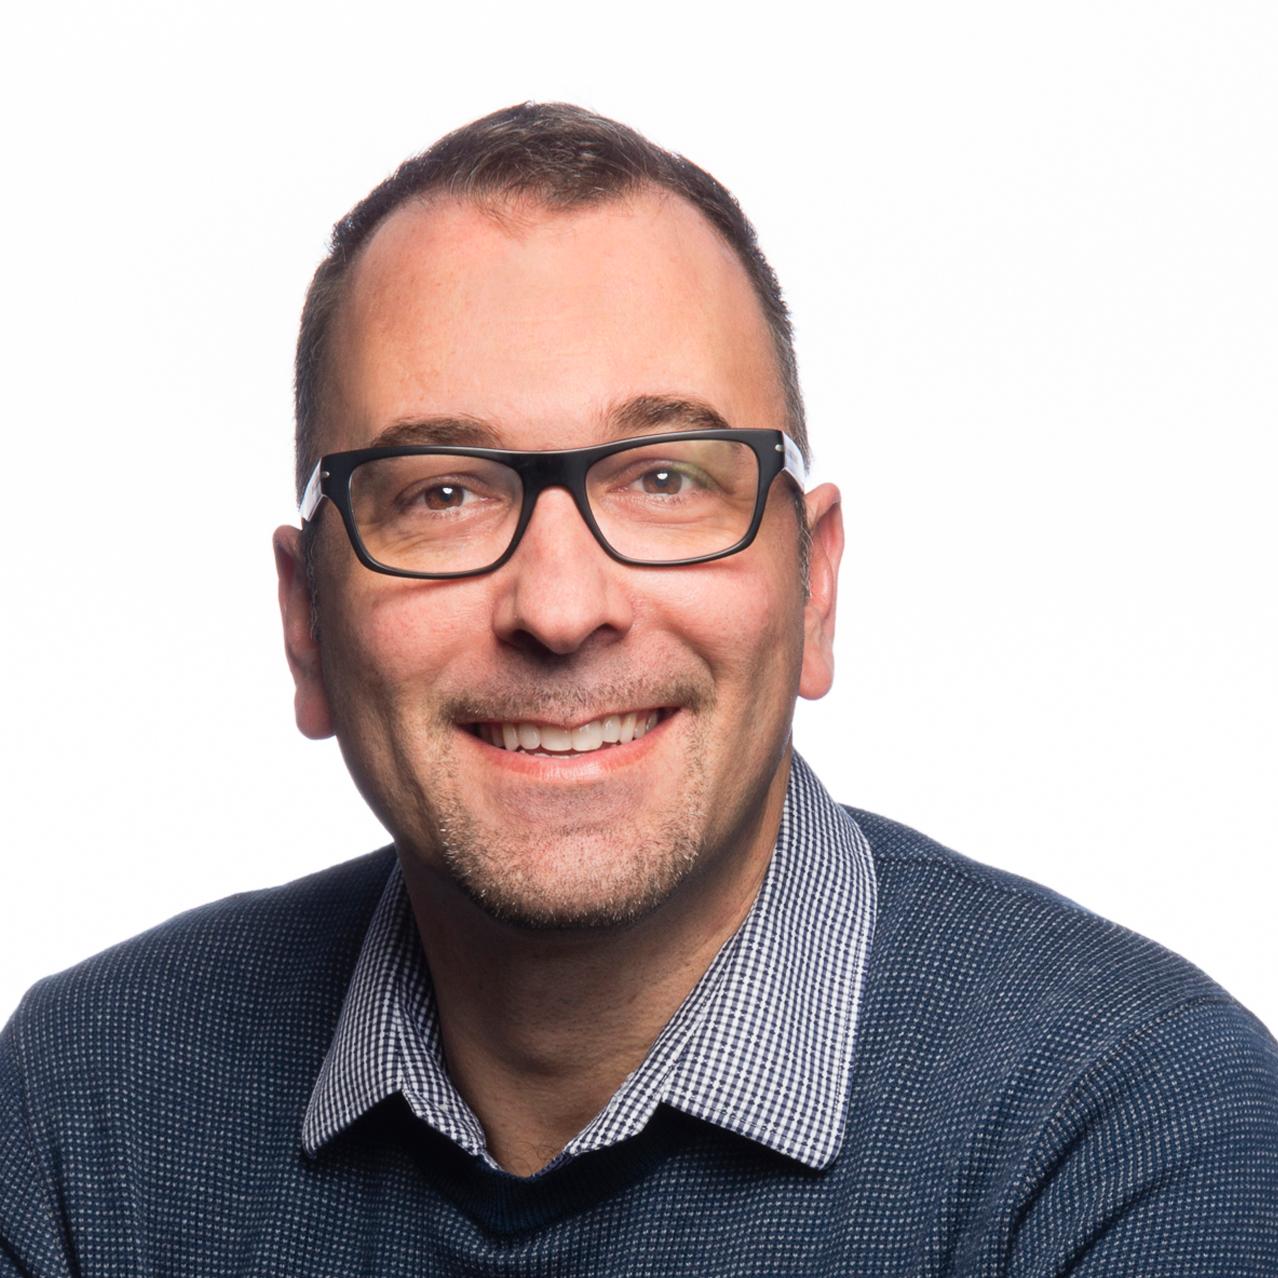 Kevin Worrell, Vice President Customer Experience at Berkley One (a Berkley Company)